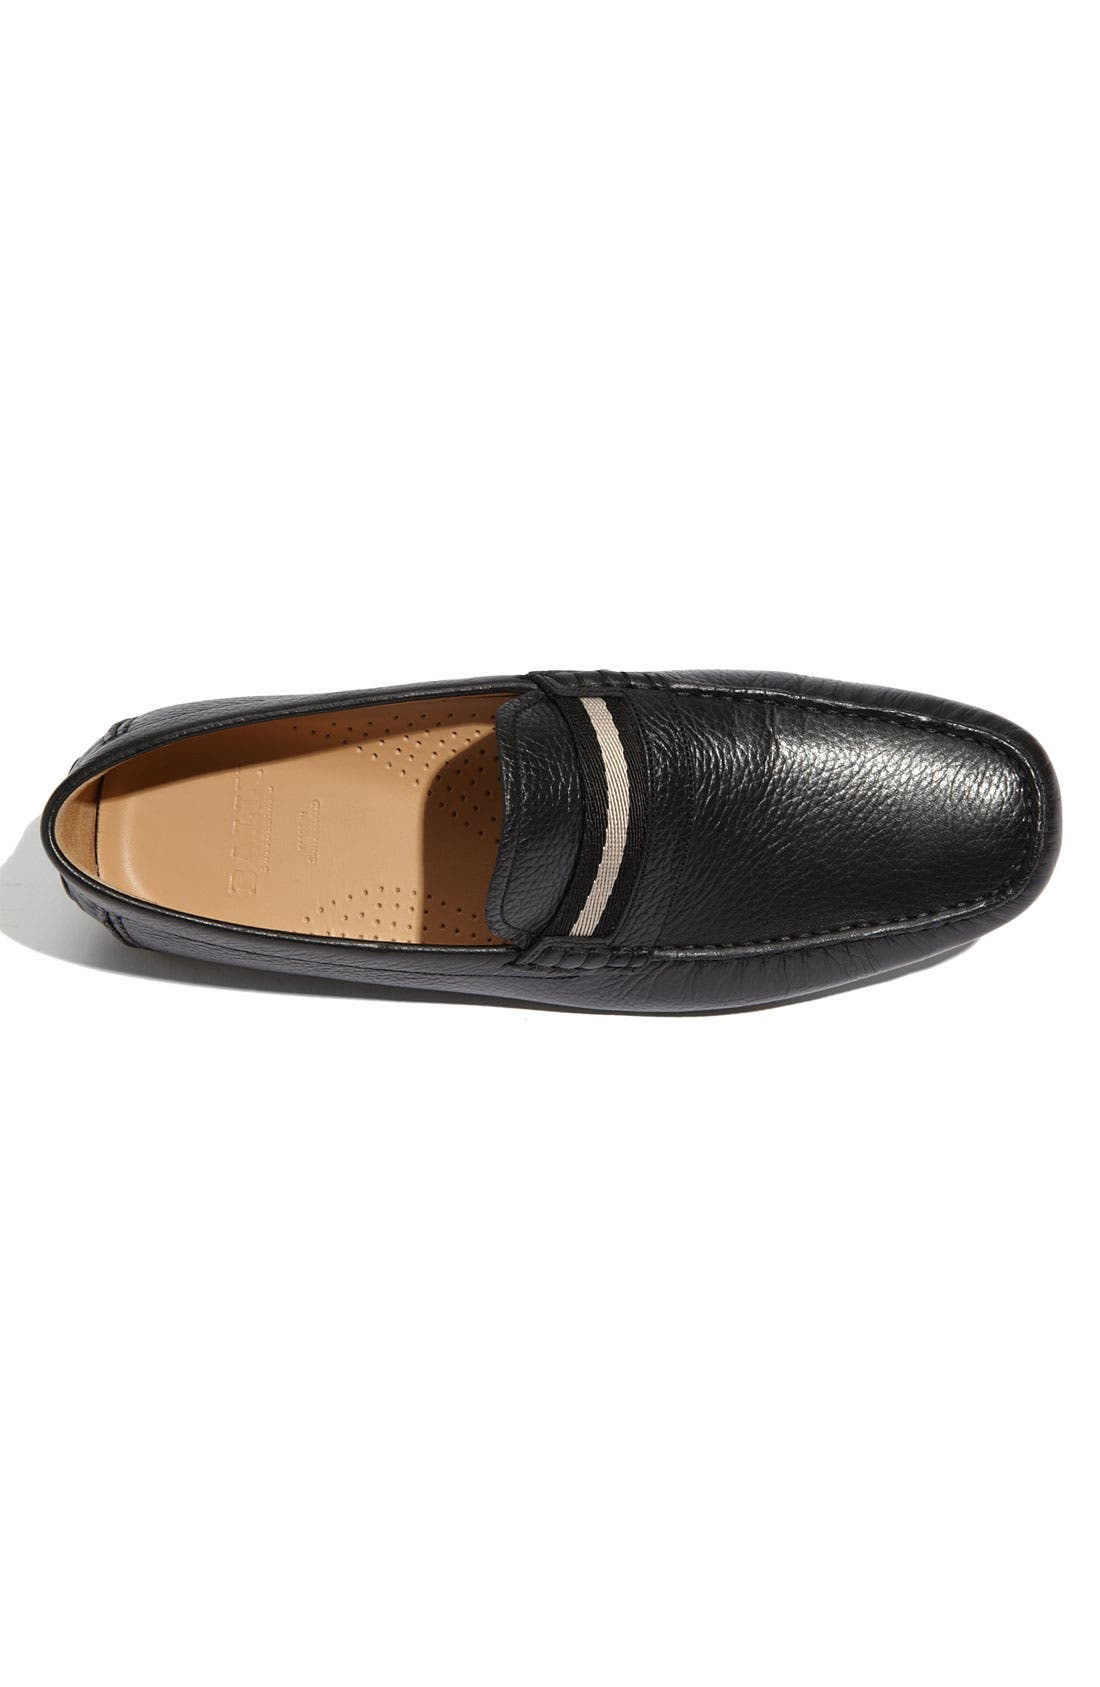 Alternate Image 3  - Bally 'Wabler' Loafer (Men)